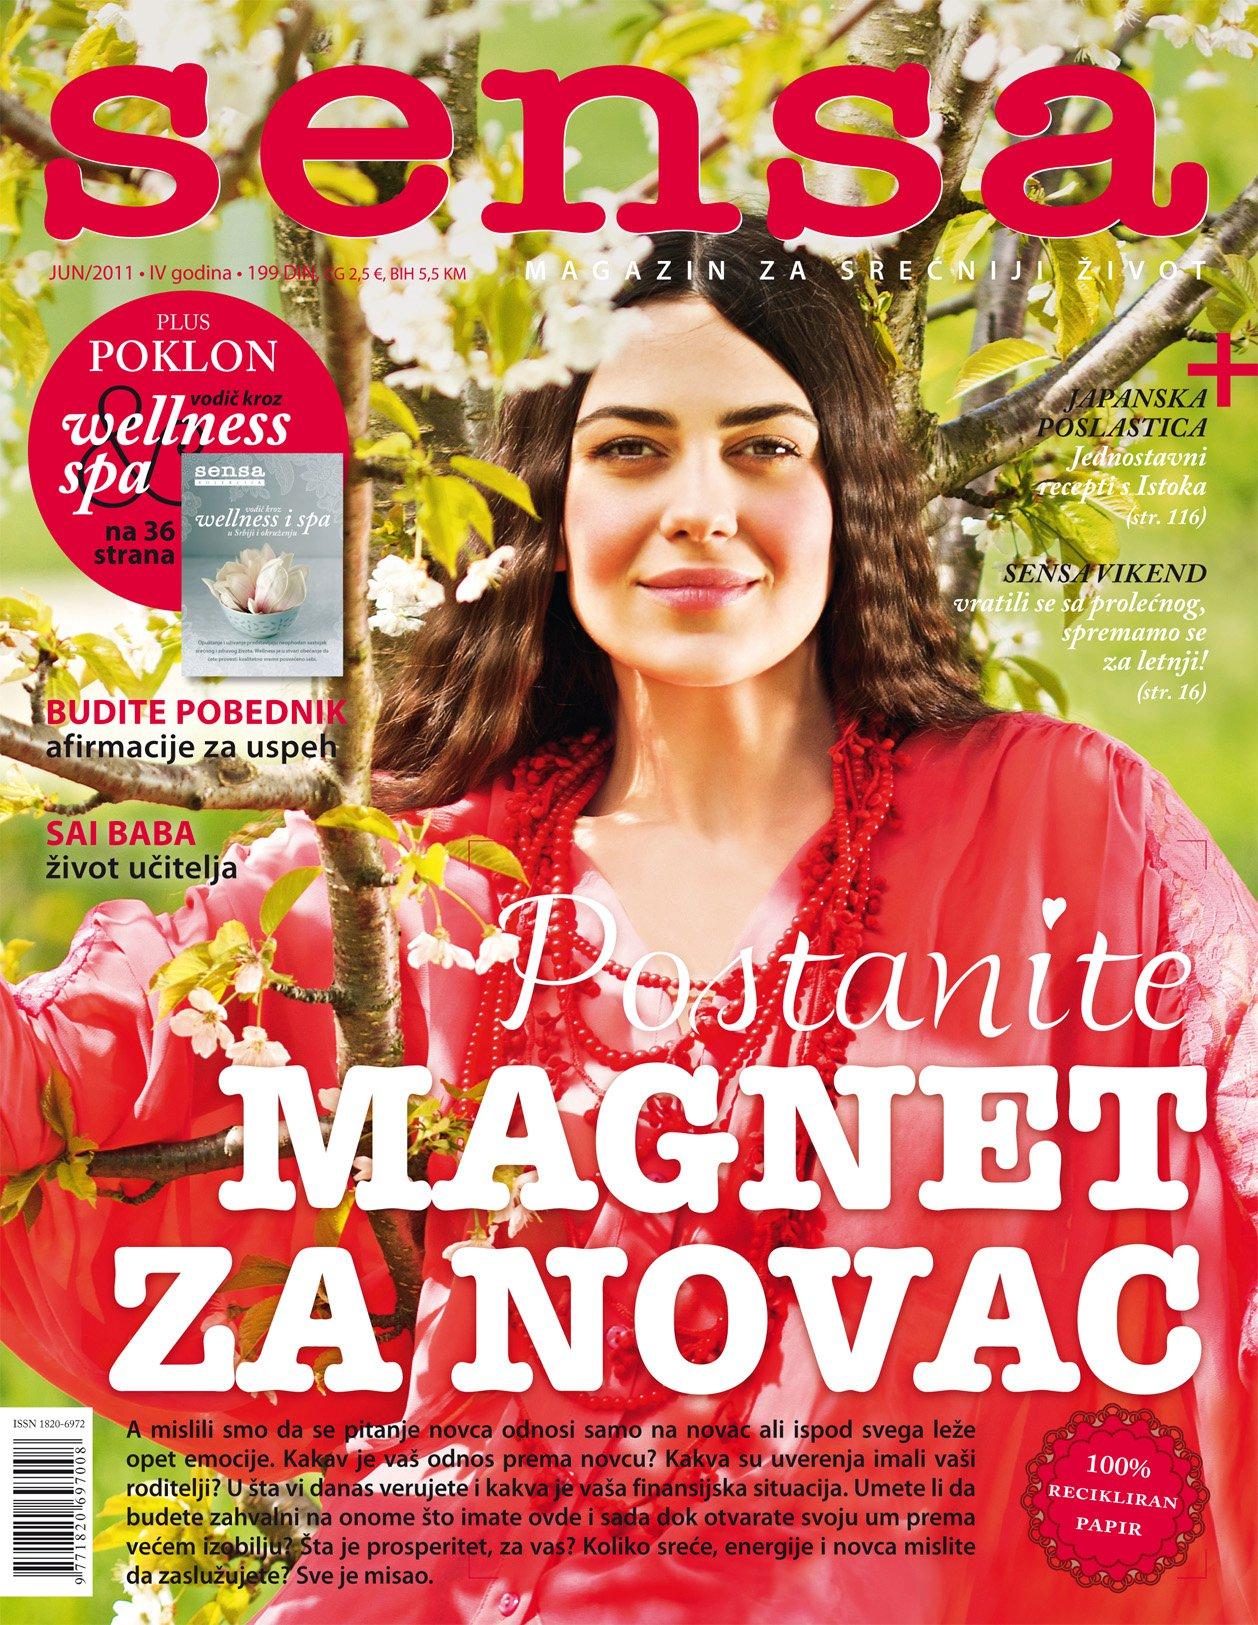 Magazin Sensa - jun 2011.